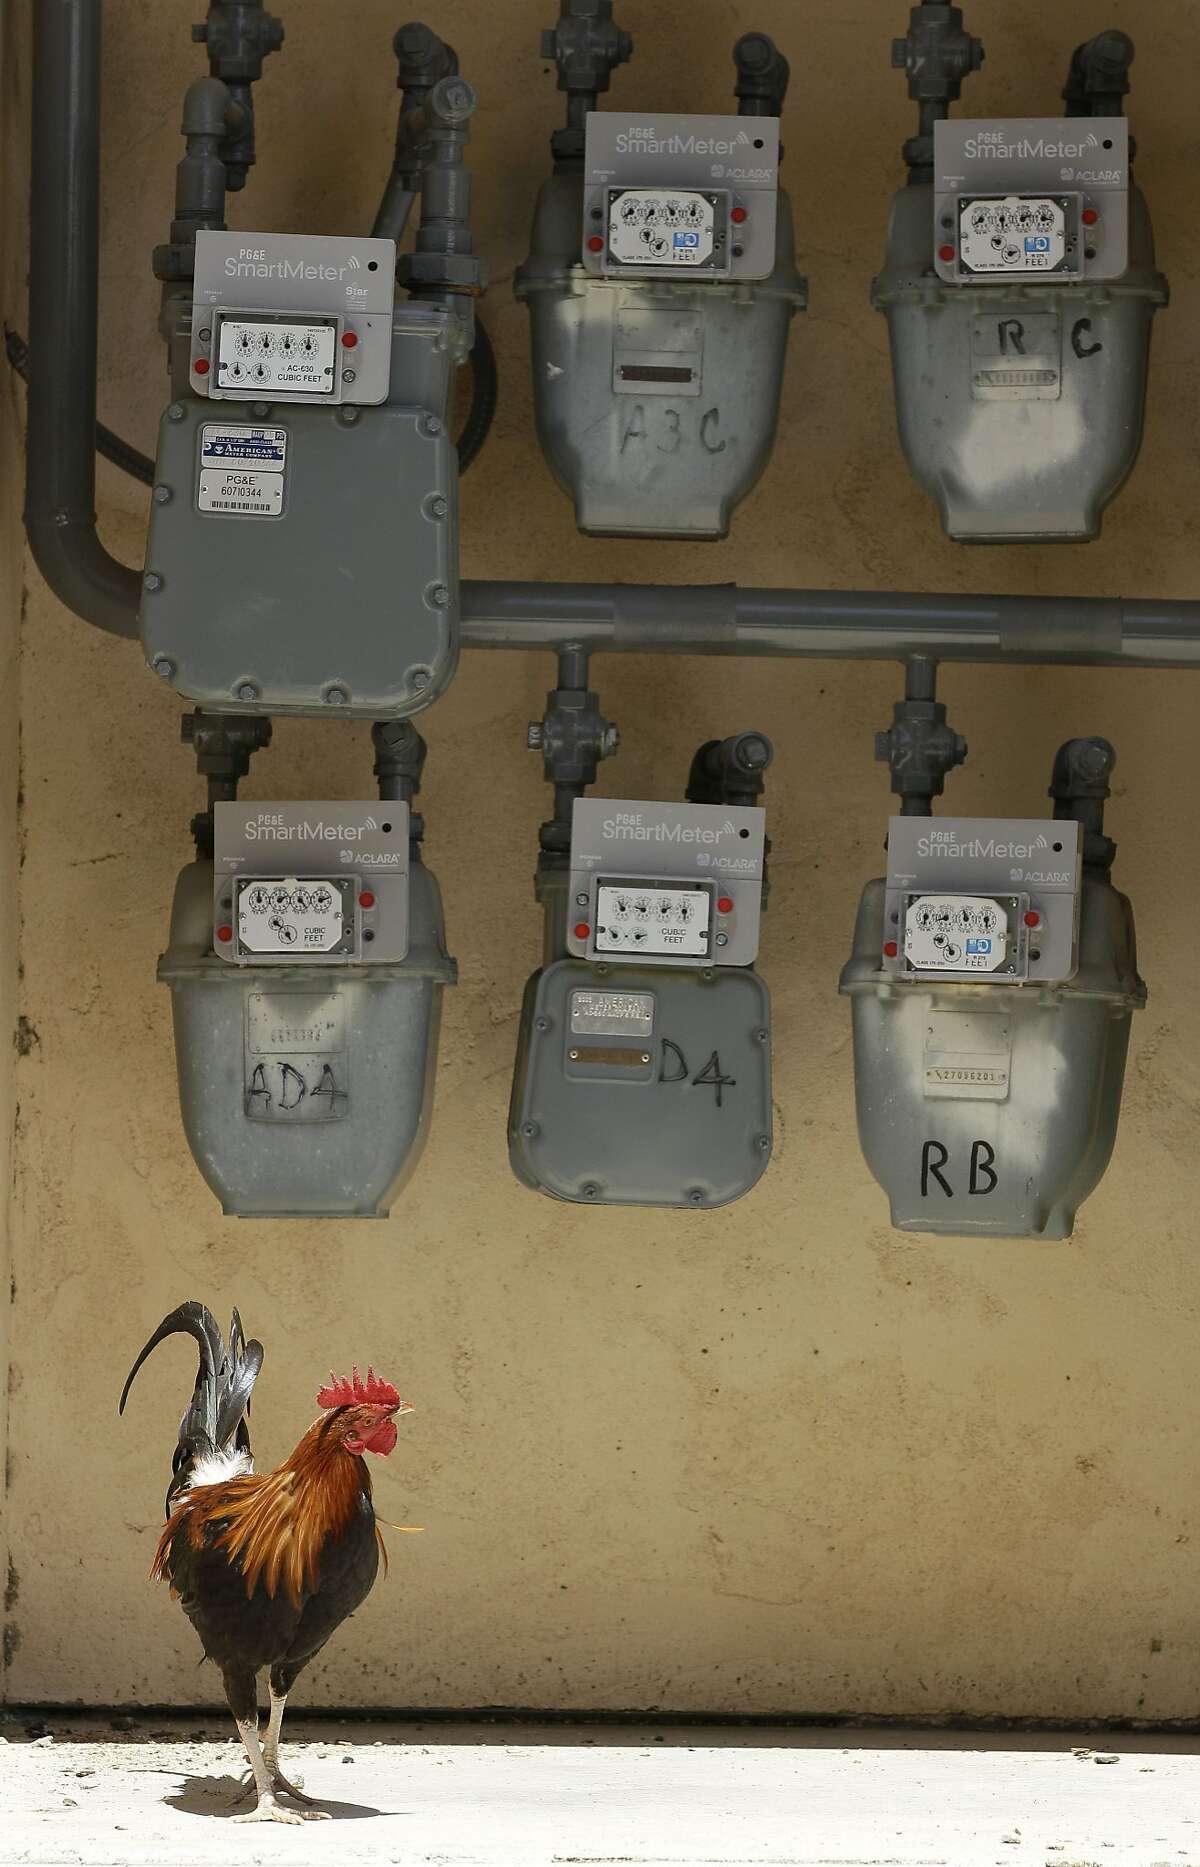 PG&E SmartMeters